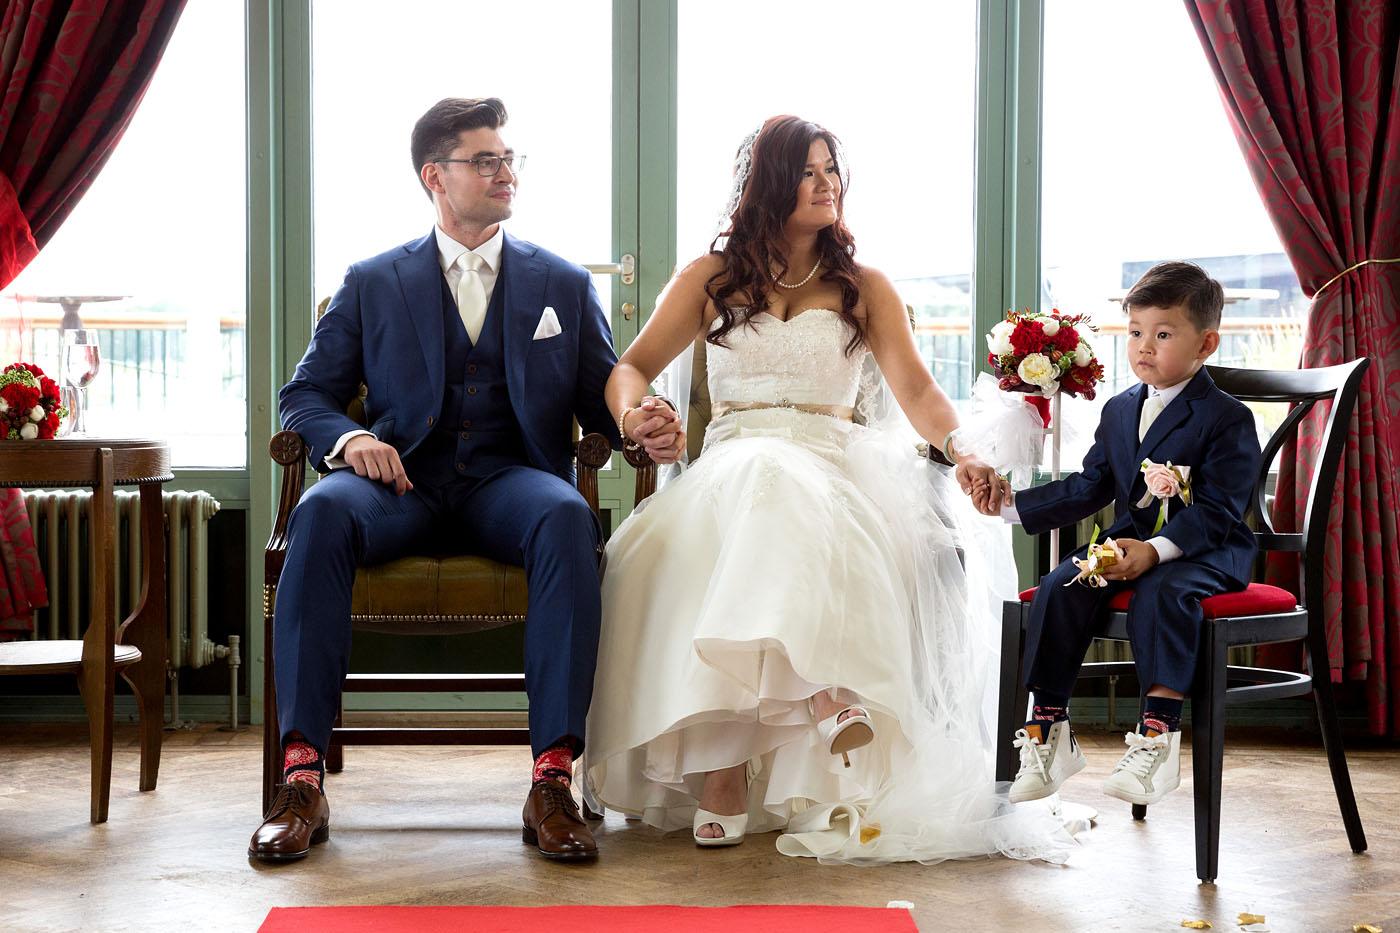 bruiloft-wedding-trouwen-fotograaf-chinees-bobhersbach-rotterdam-holdinghands